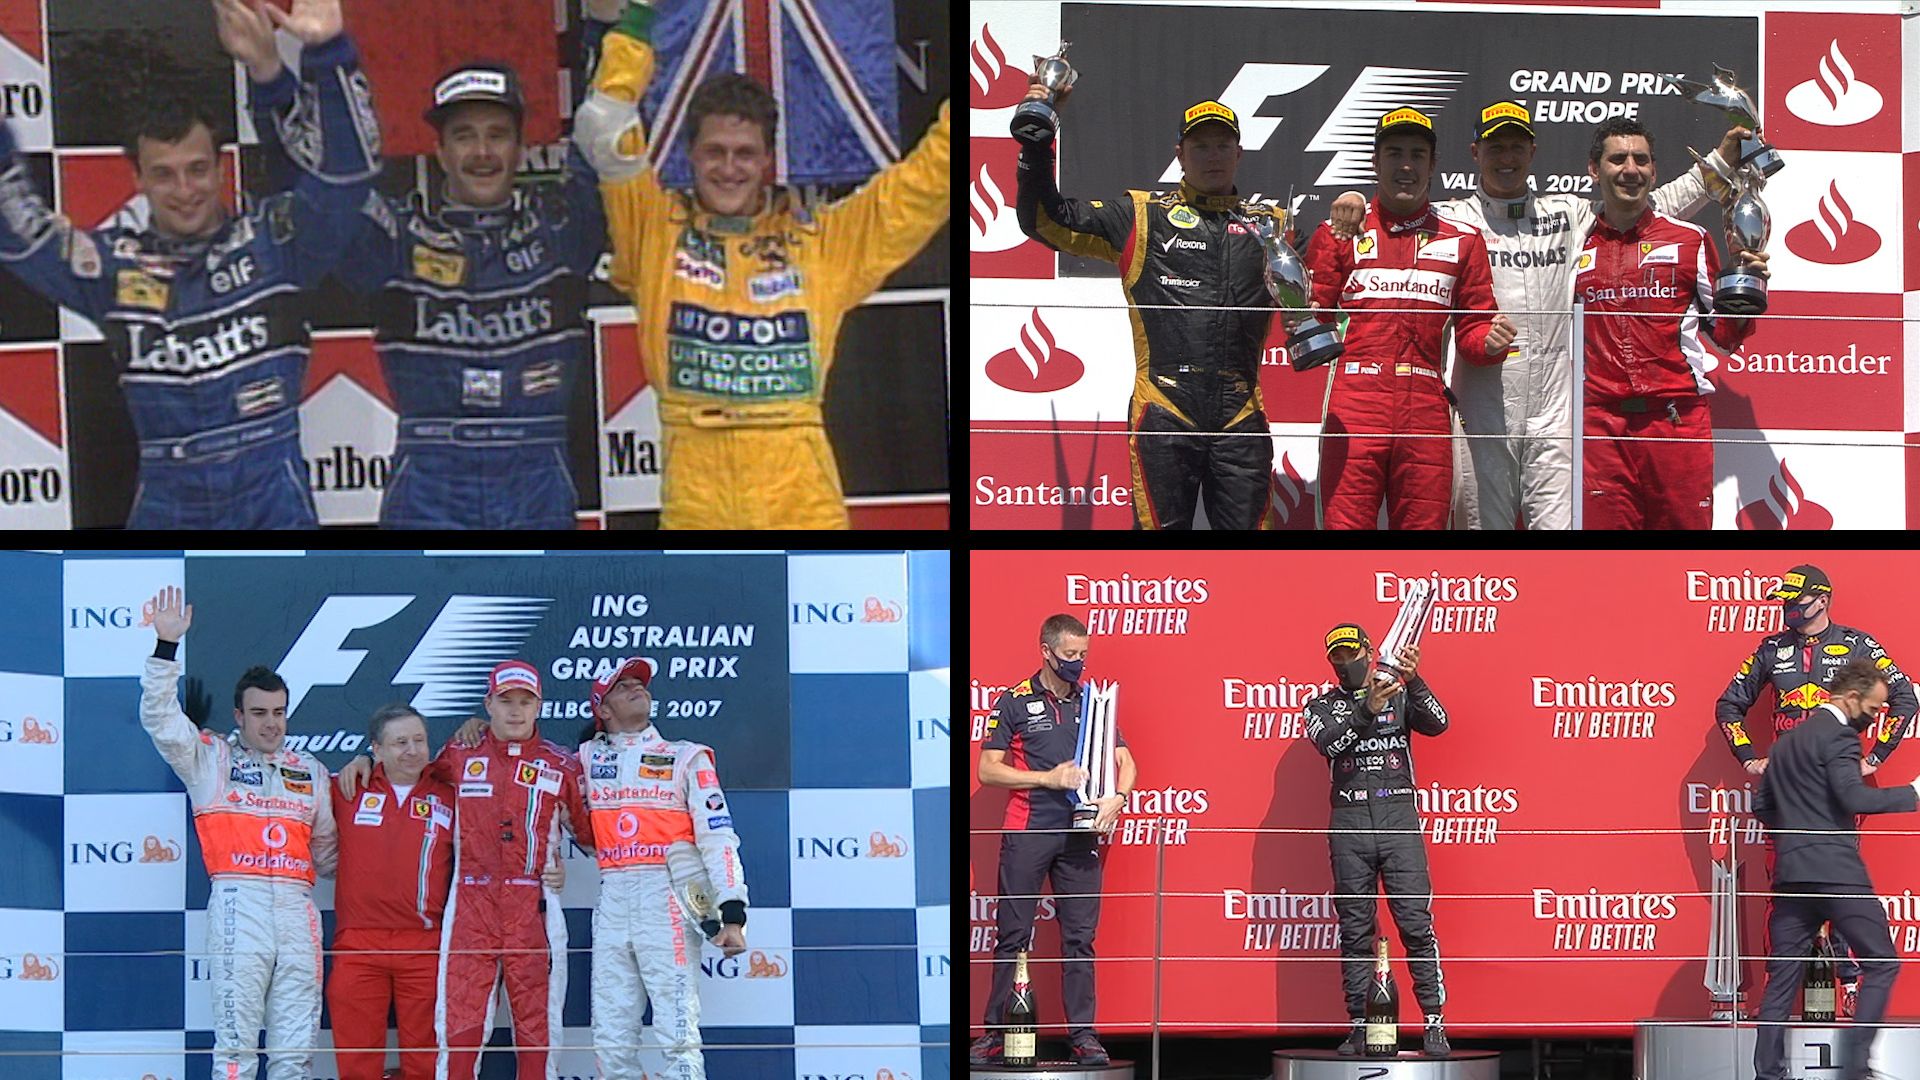 Hamilton matches Schumacher's incredible record of 155 podiums